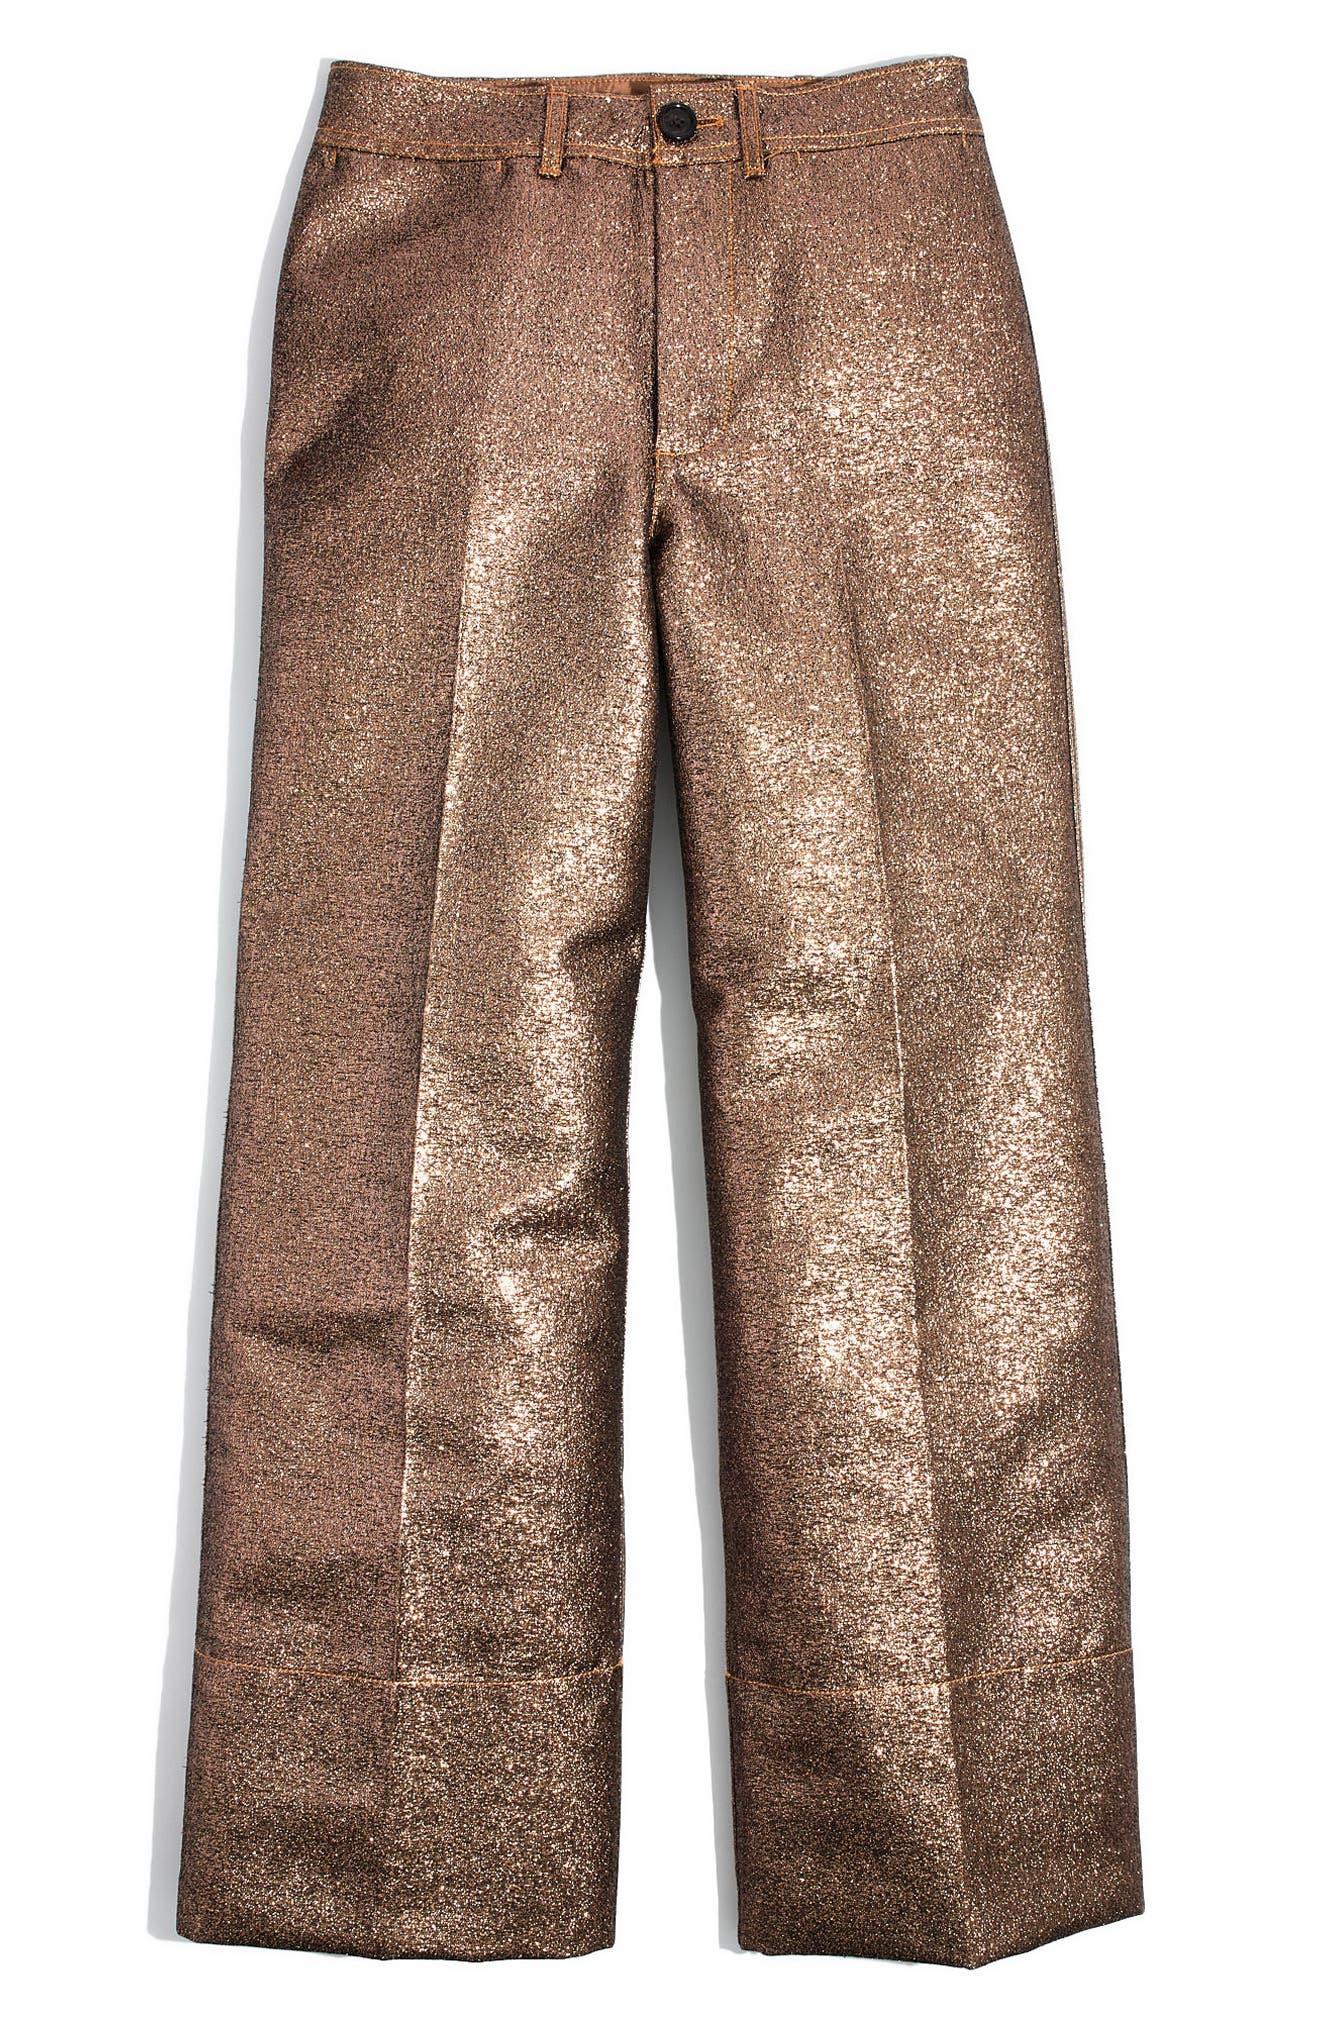 Langford Metallic Crop Wide Leg Pants,                             Alternate thumbnail 4, color,                             220